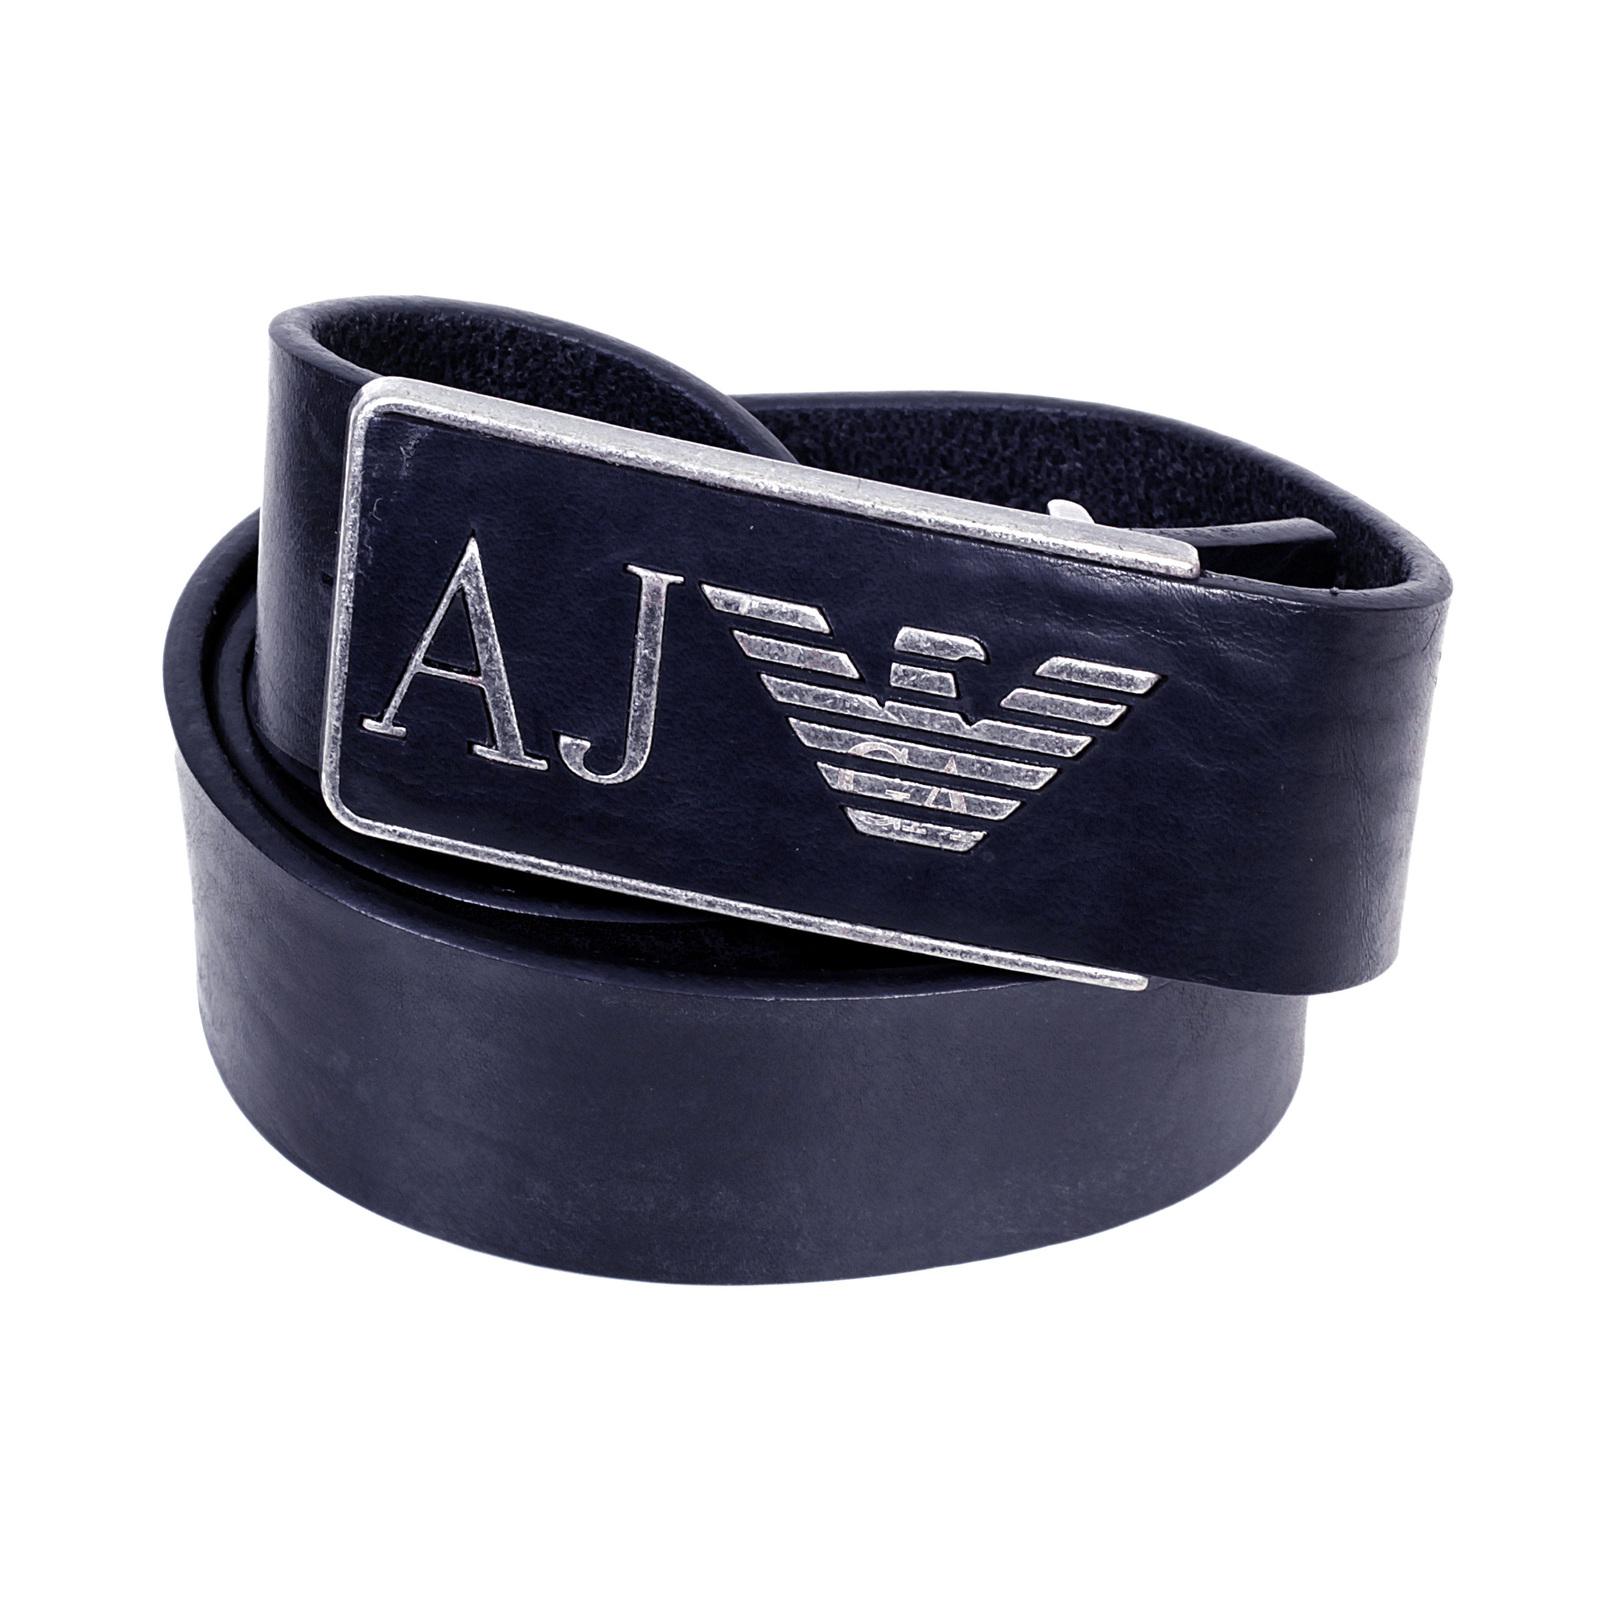 armani mens navy rectangular buckle leather belt ajm4694